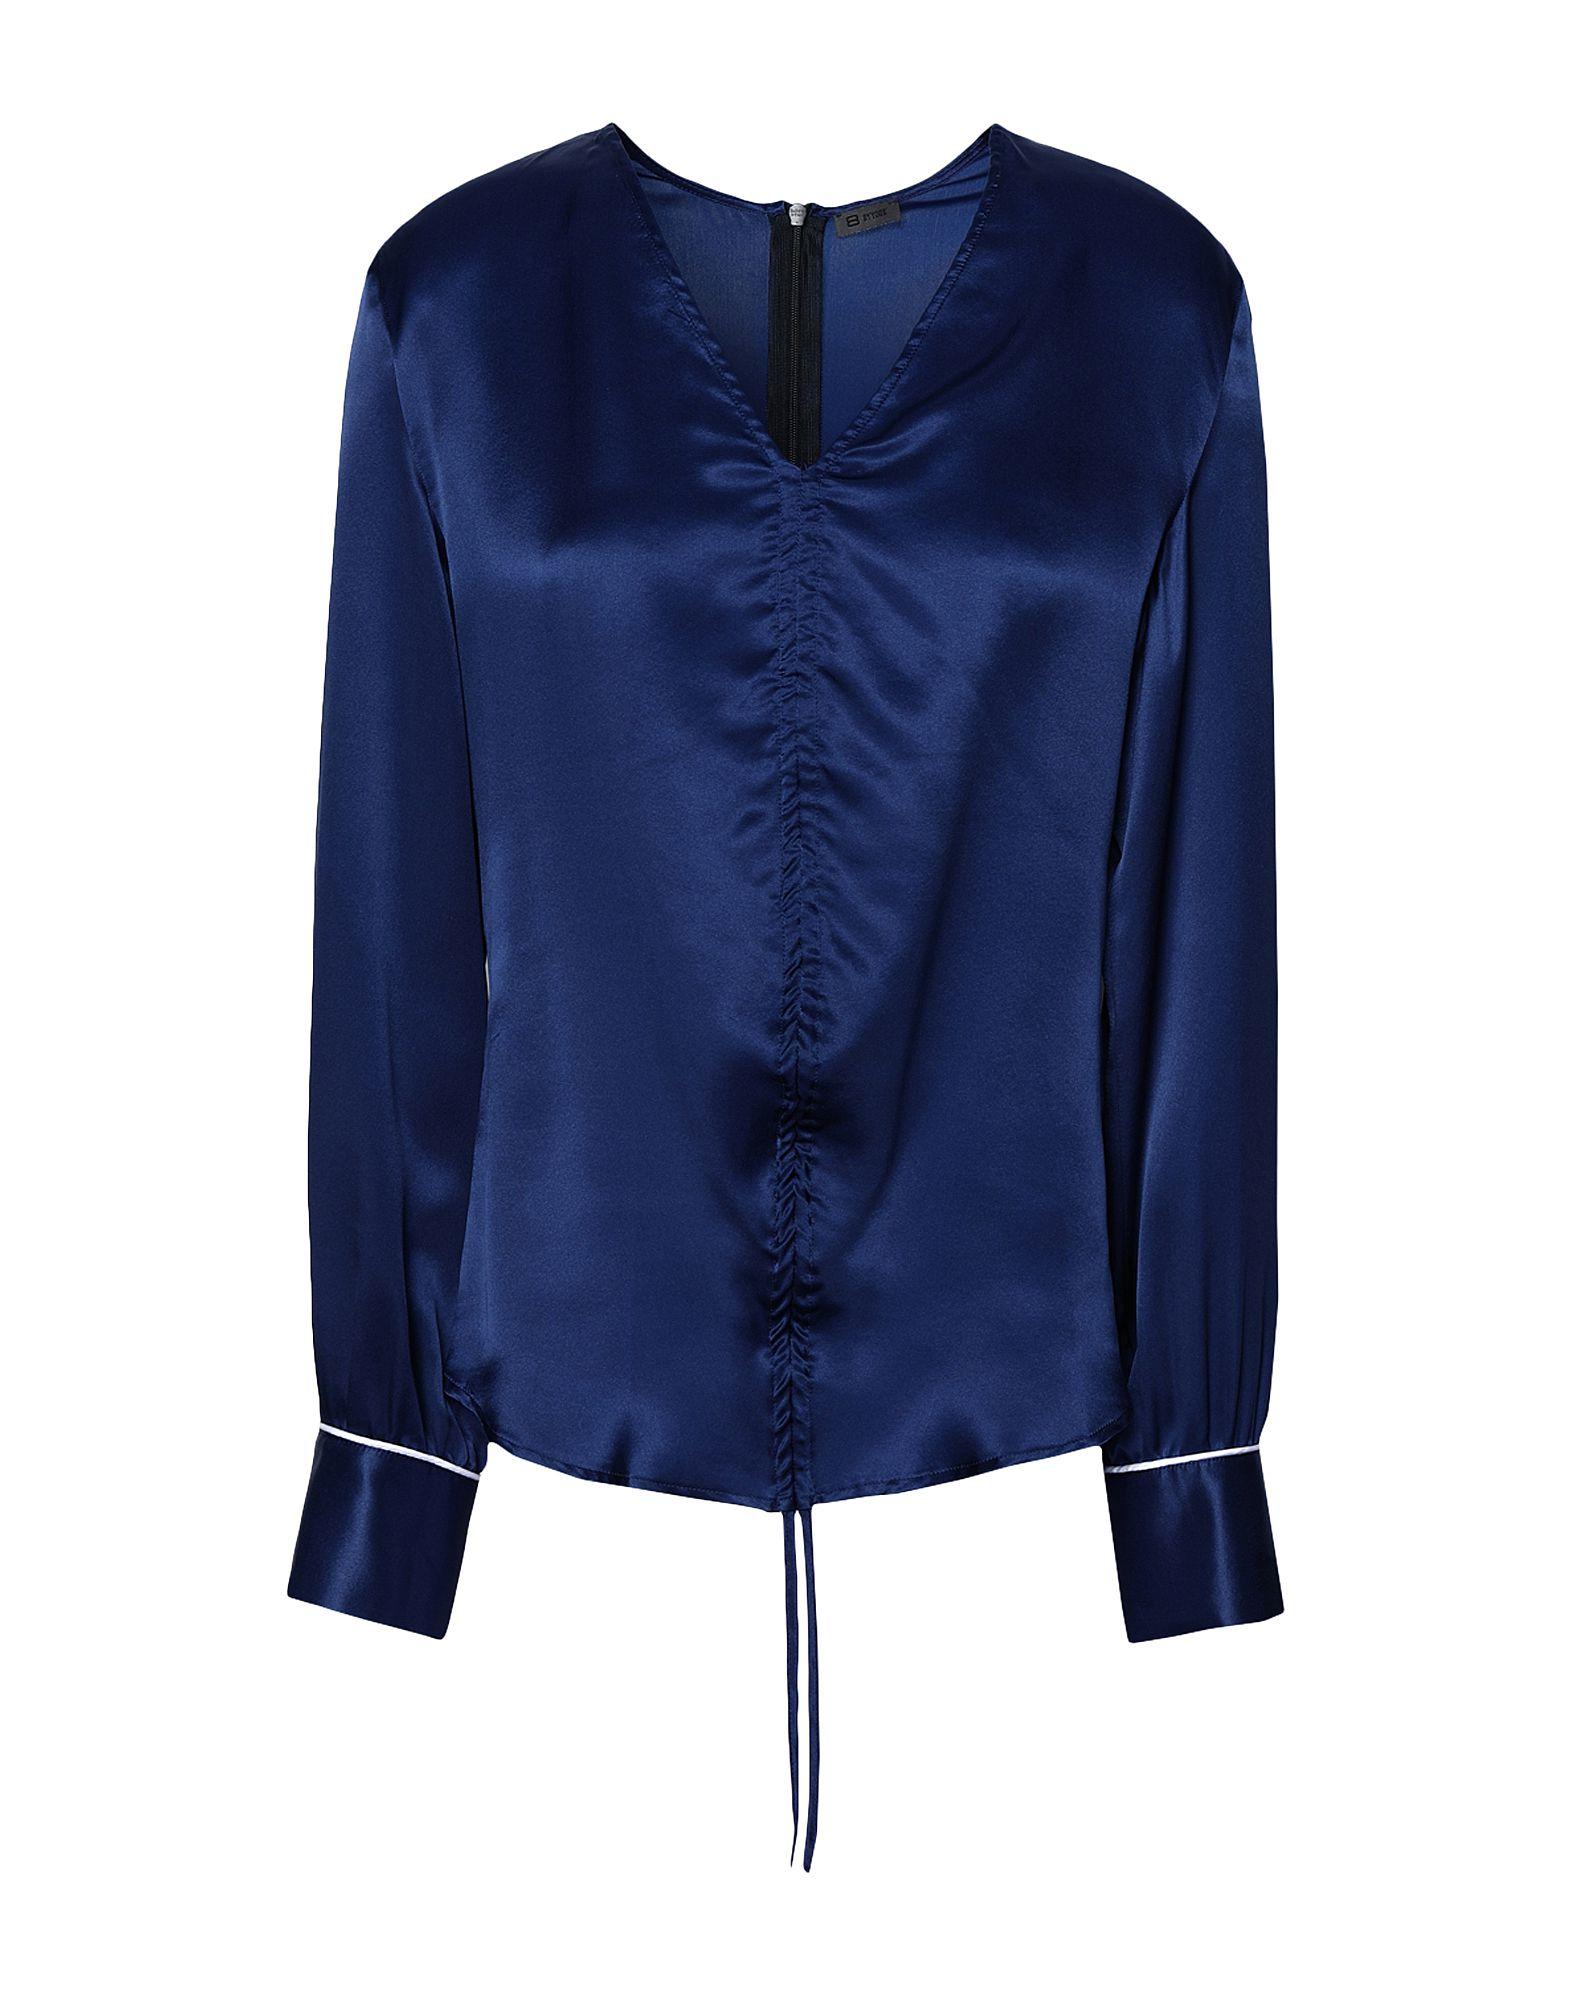 8 by YOOX Блузка блузка lime блузка с завязками